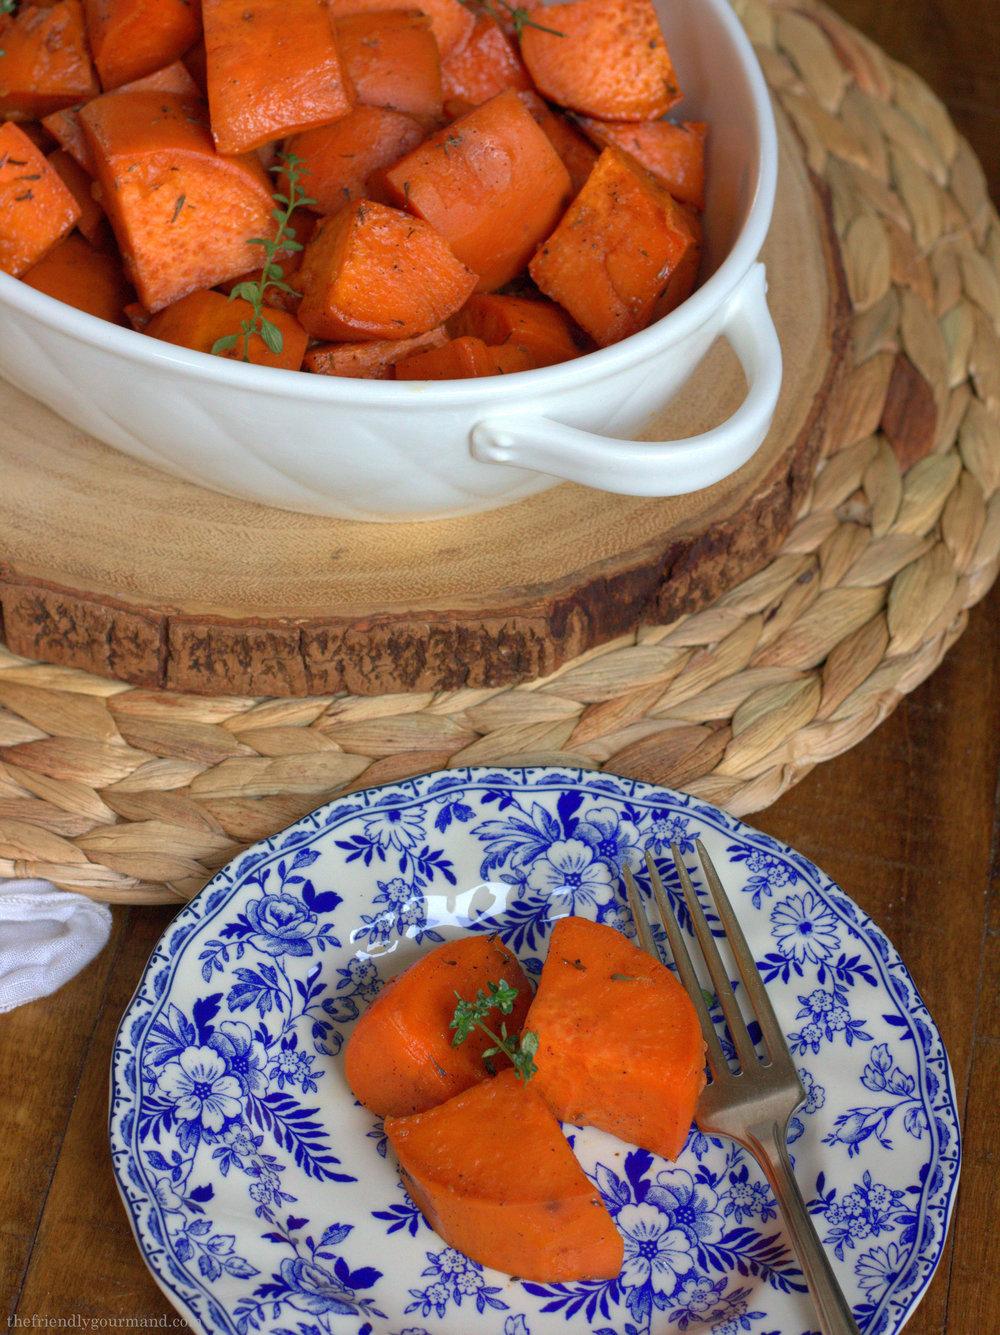 maple-glazed-sweet-potatoes_the-friendly-gourmand_low-fodmap-gluten-free-vegan_8.jpg